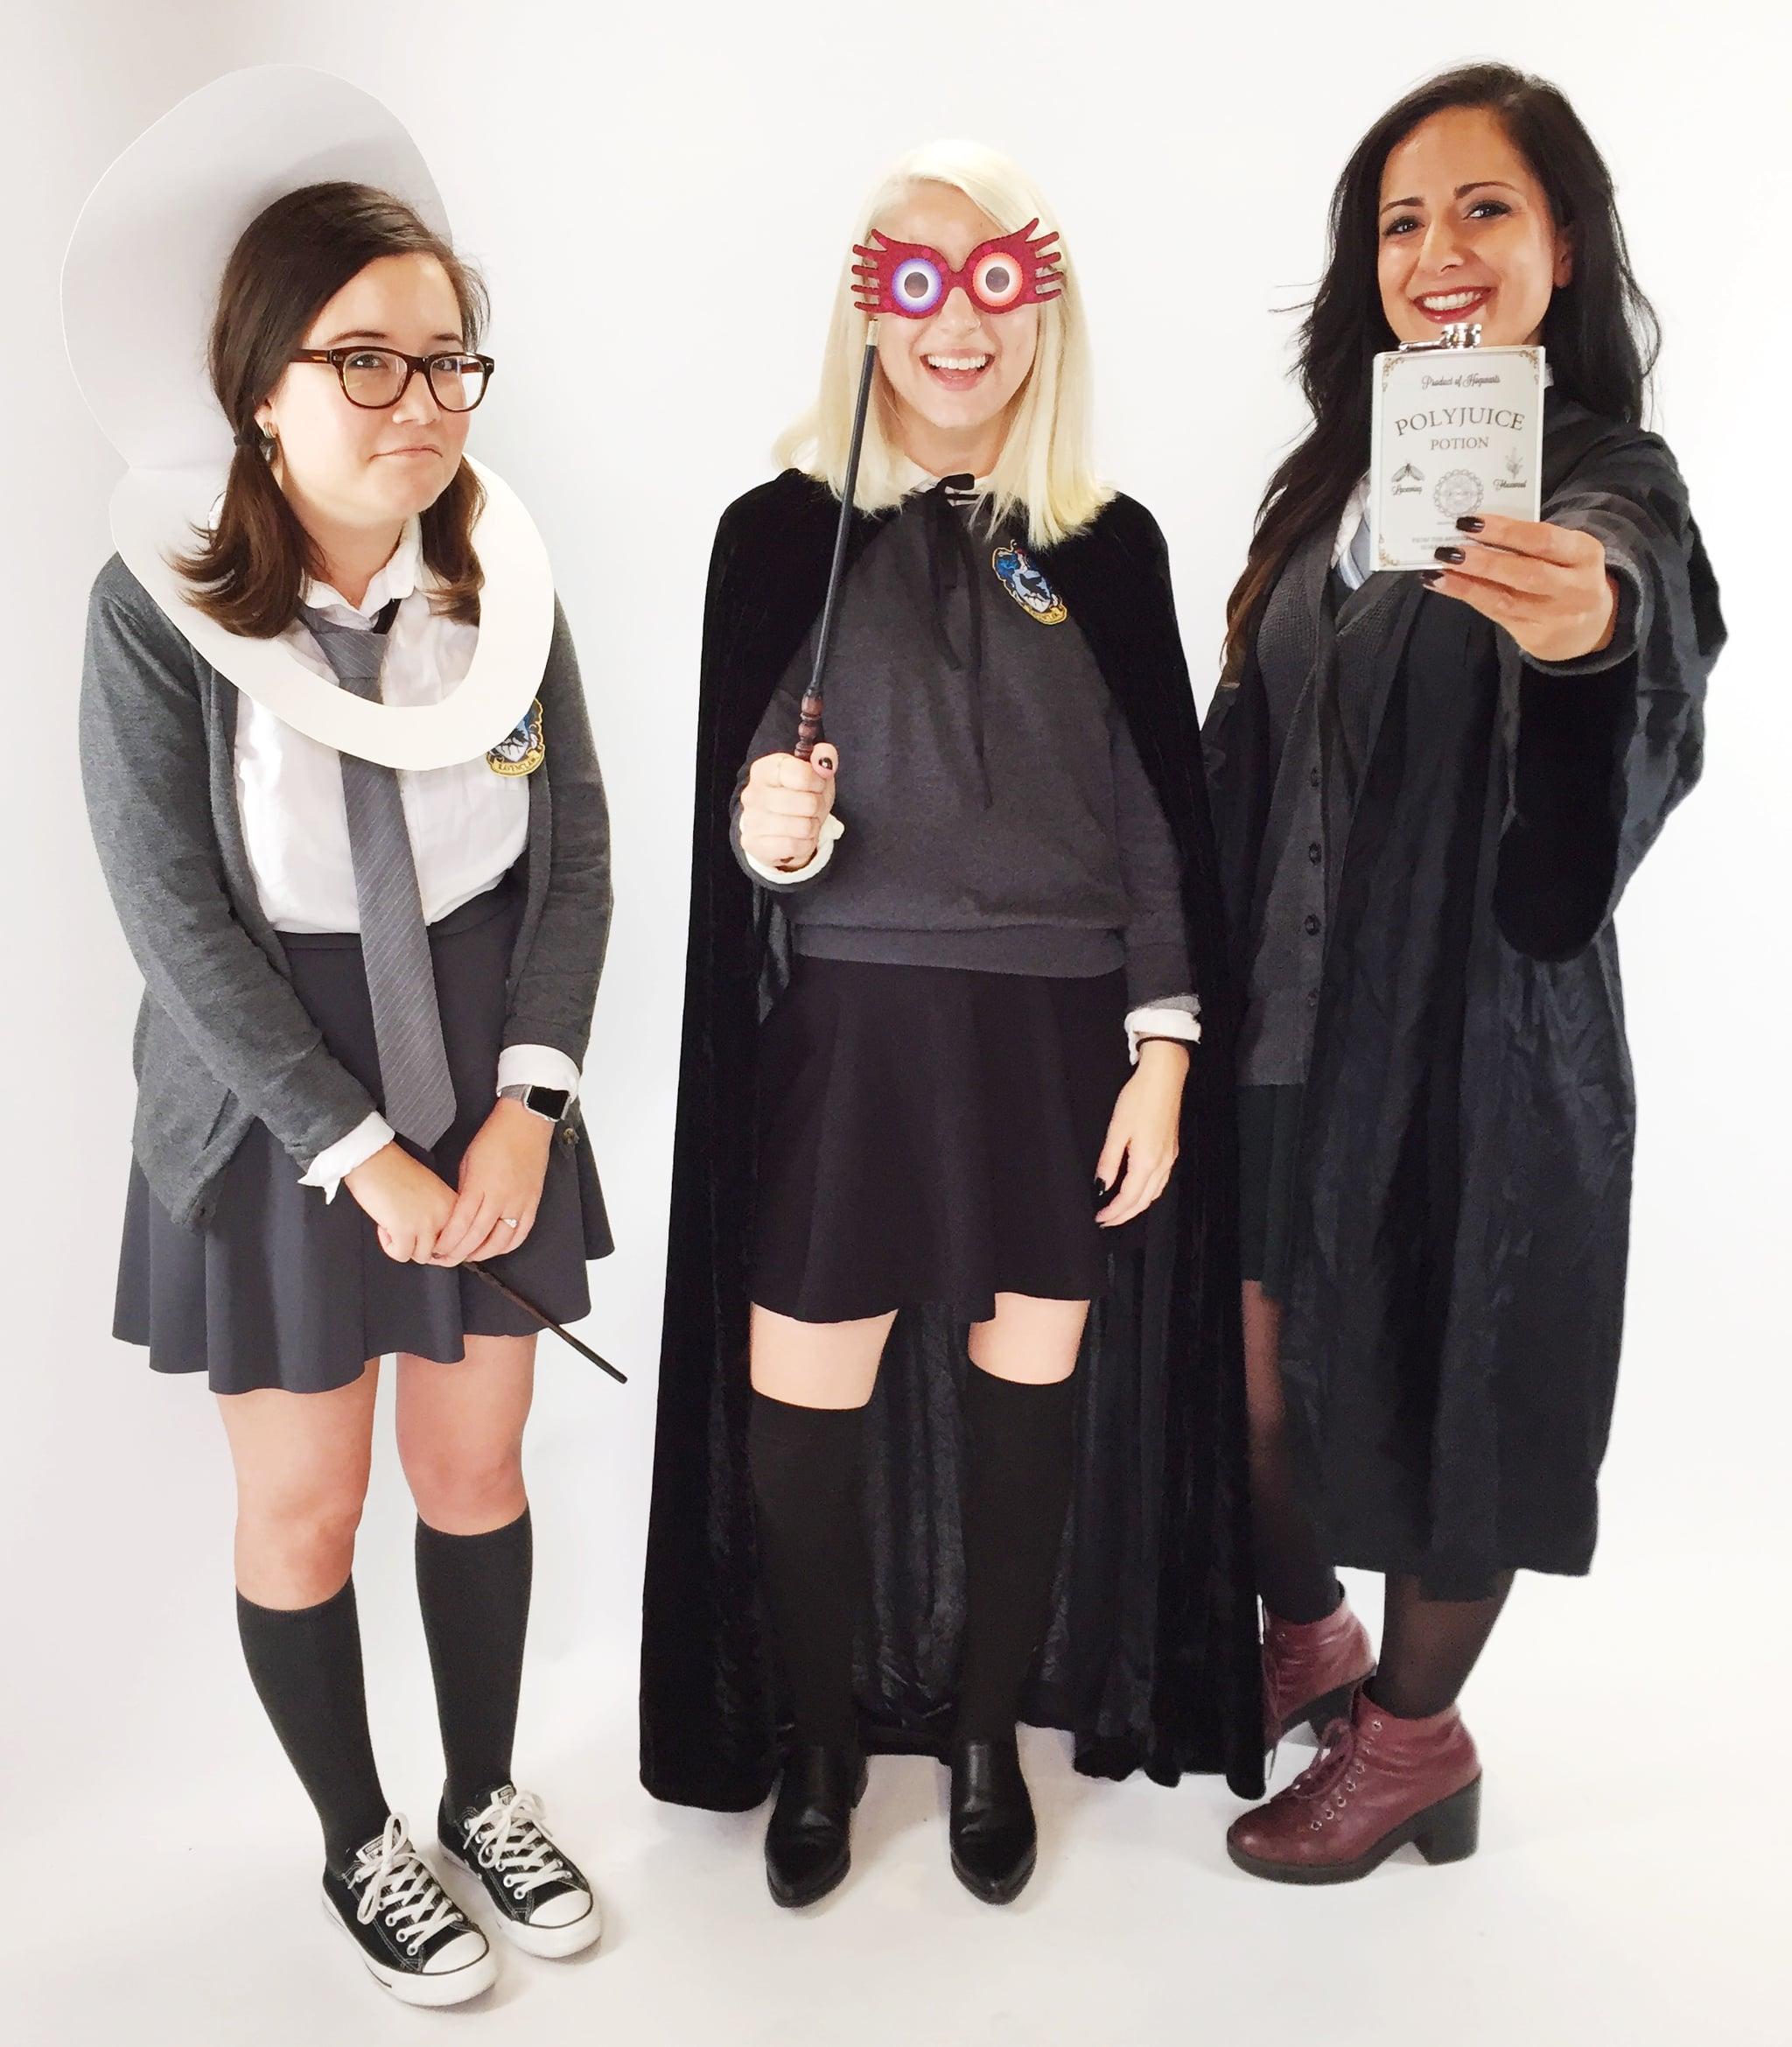 Harry Potter Group Costumes Popsugar Tech